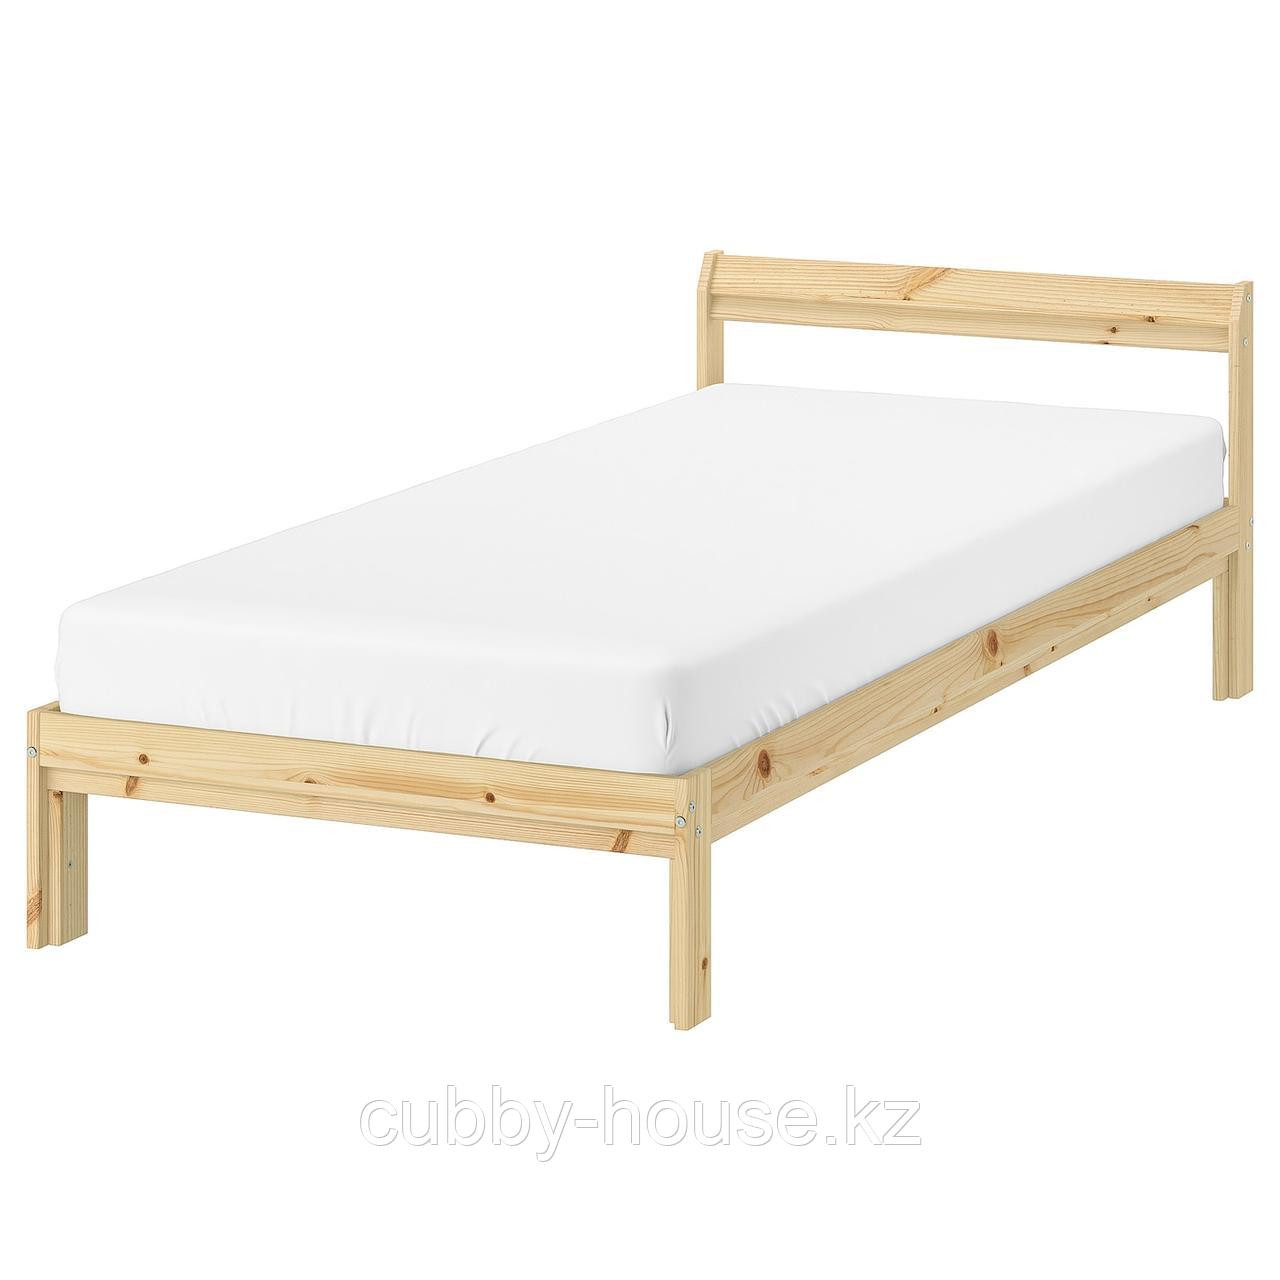 НЕЙДЕН Каркас кровати, сосна, 90x200 см